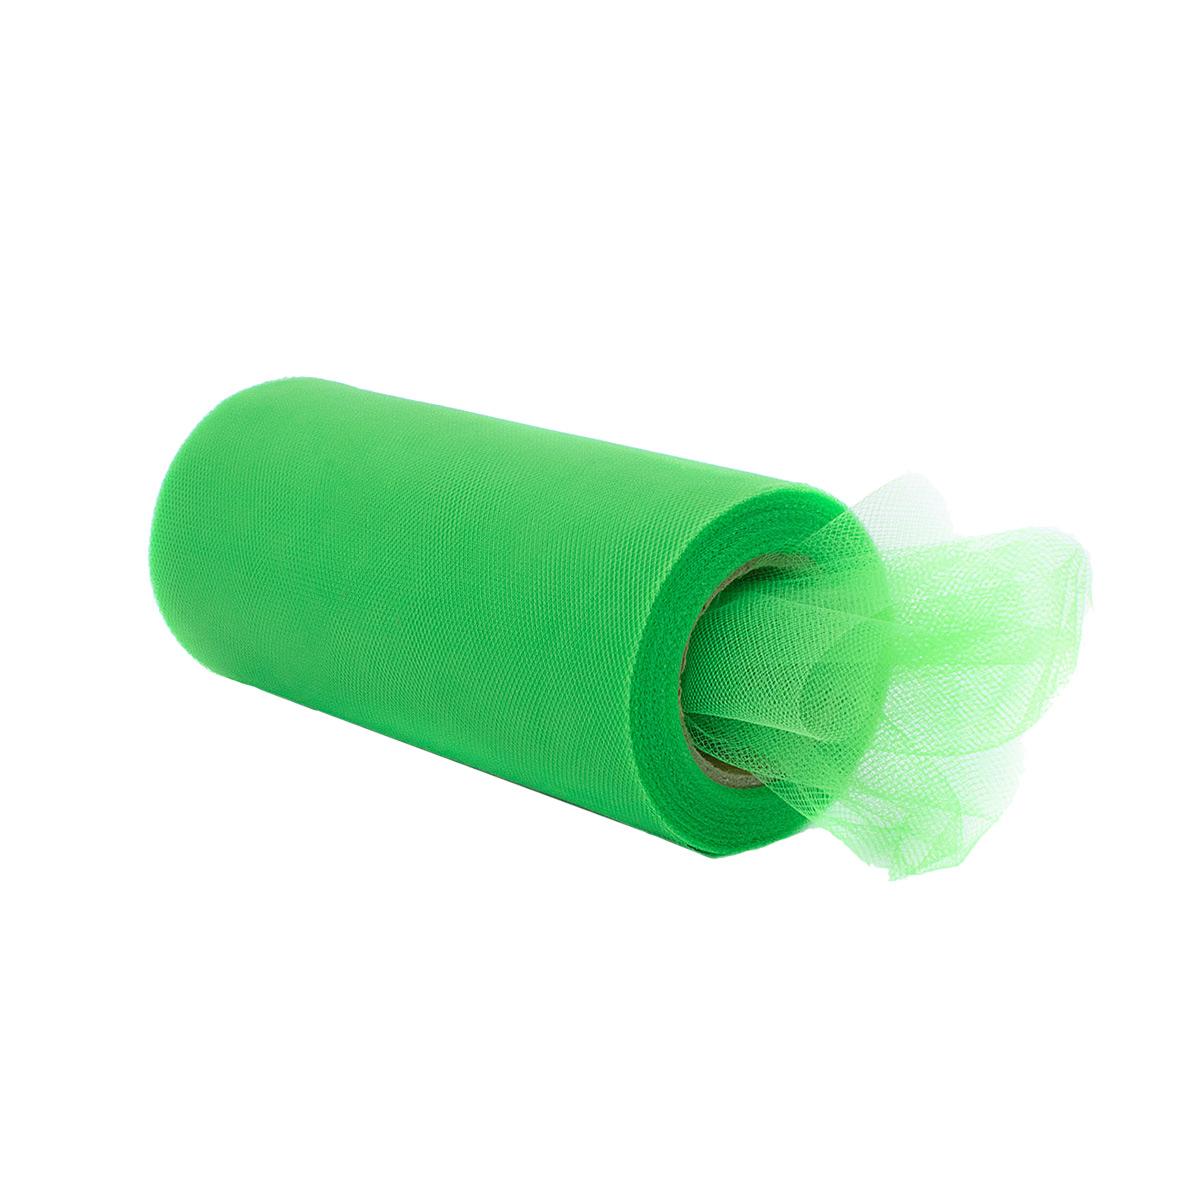 1AS-053 Фатин средней жесткости в шпульках 150мм*22,86м